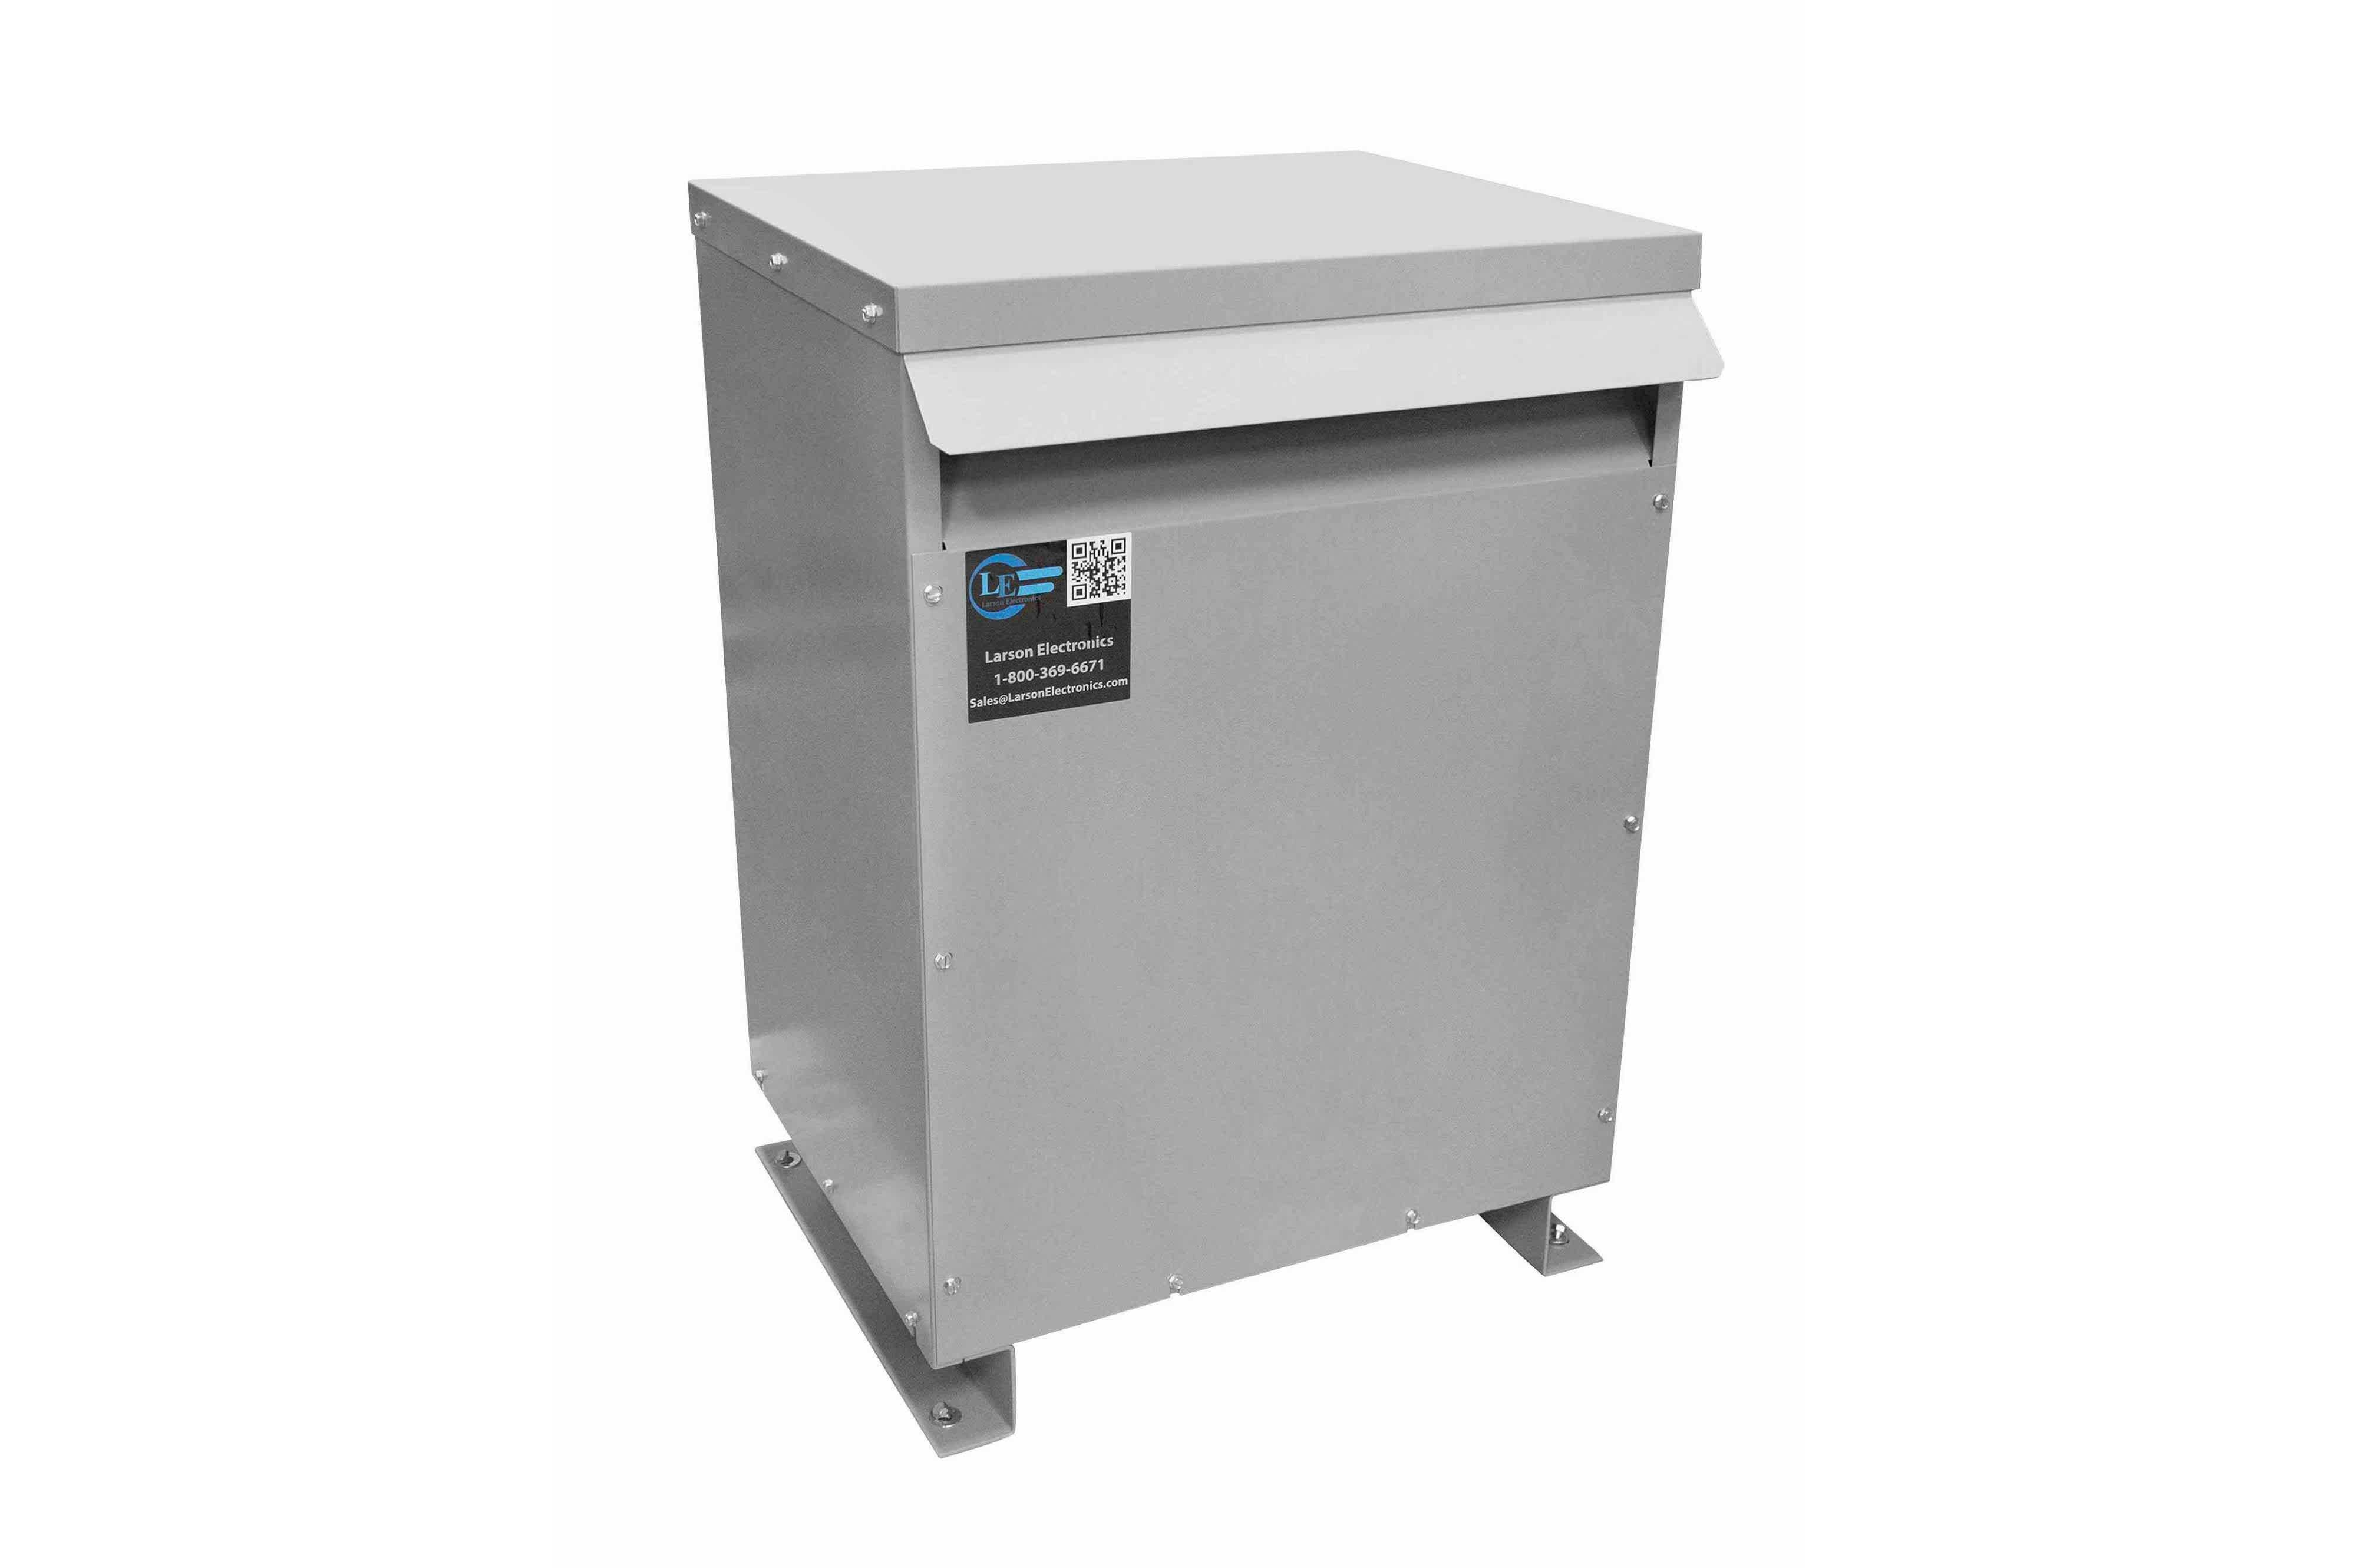 29 kVA 3PH Isolation Transformer, 460V Wye Primary, 600Y/347 Wye-N Secondary, N3R, Ventilated, 60 Hz